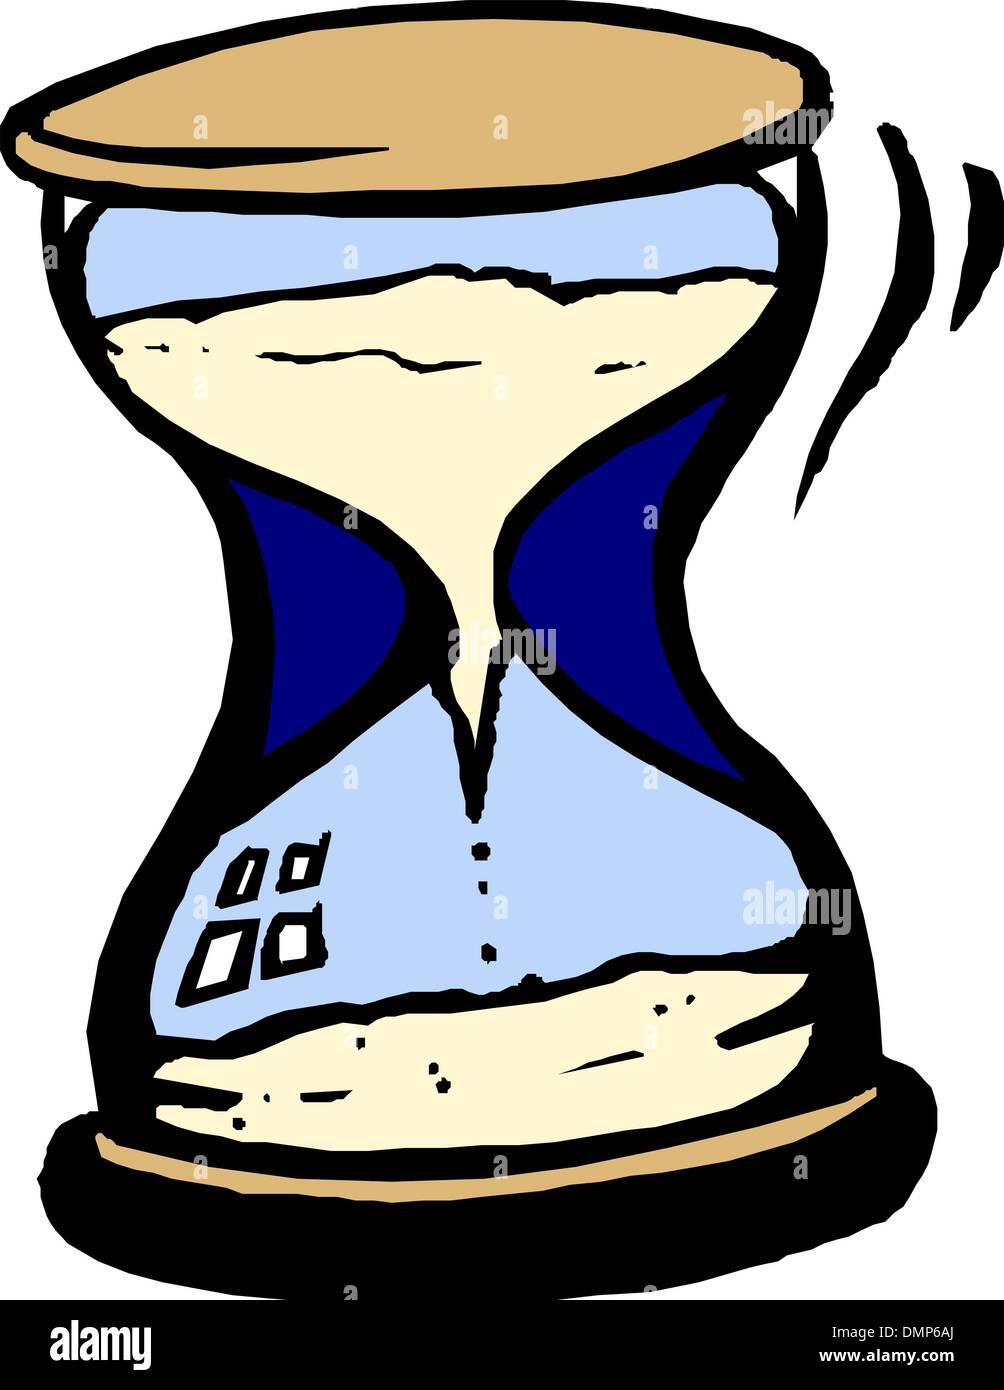 Hourglass - Stock Image